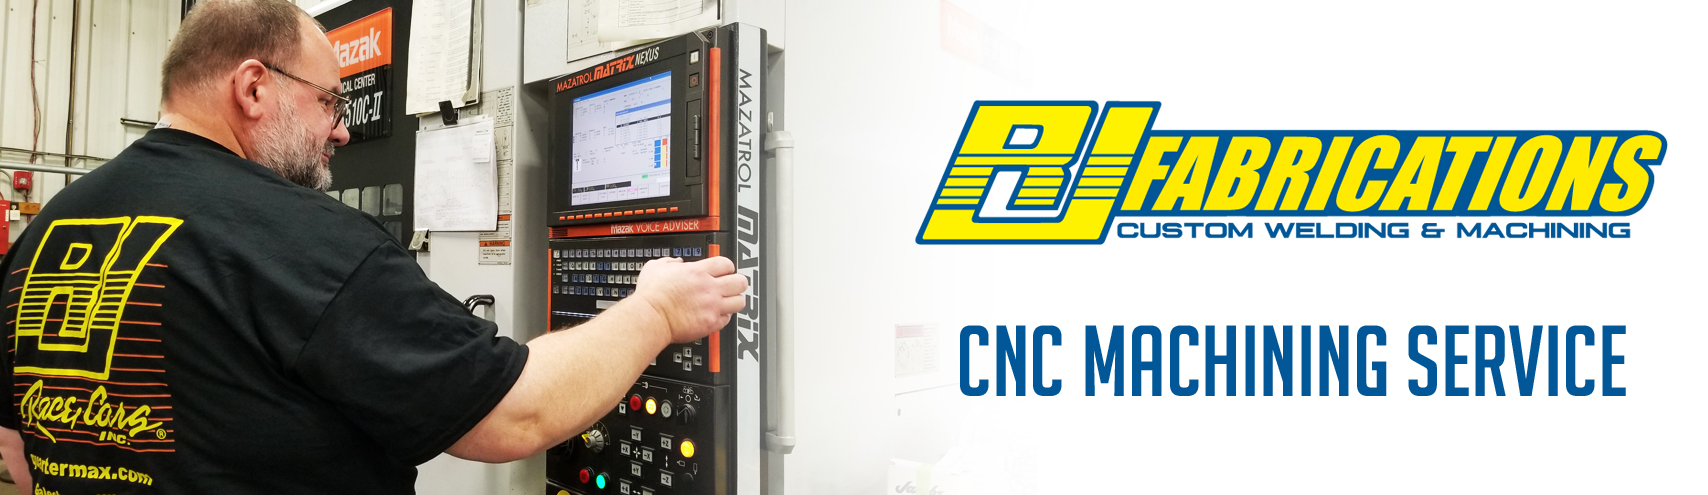 cnc-services-banner.jpg